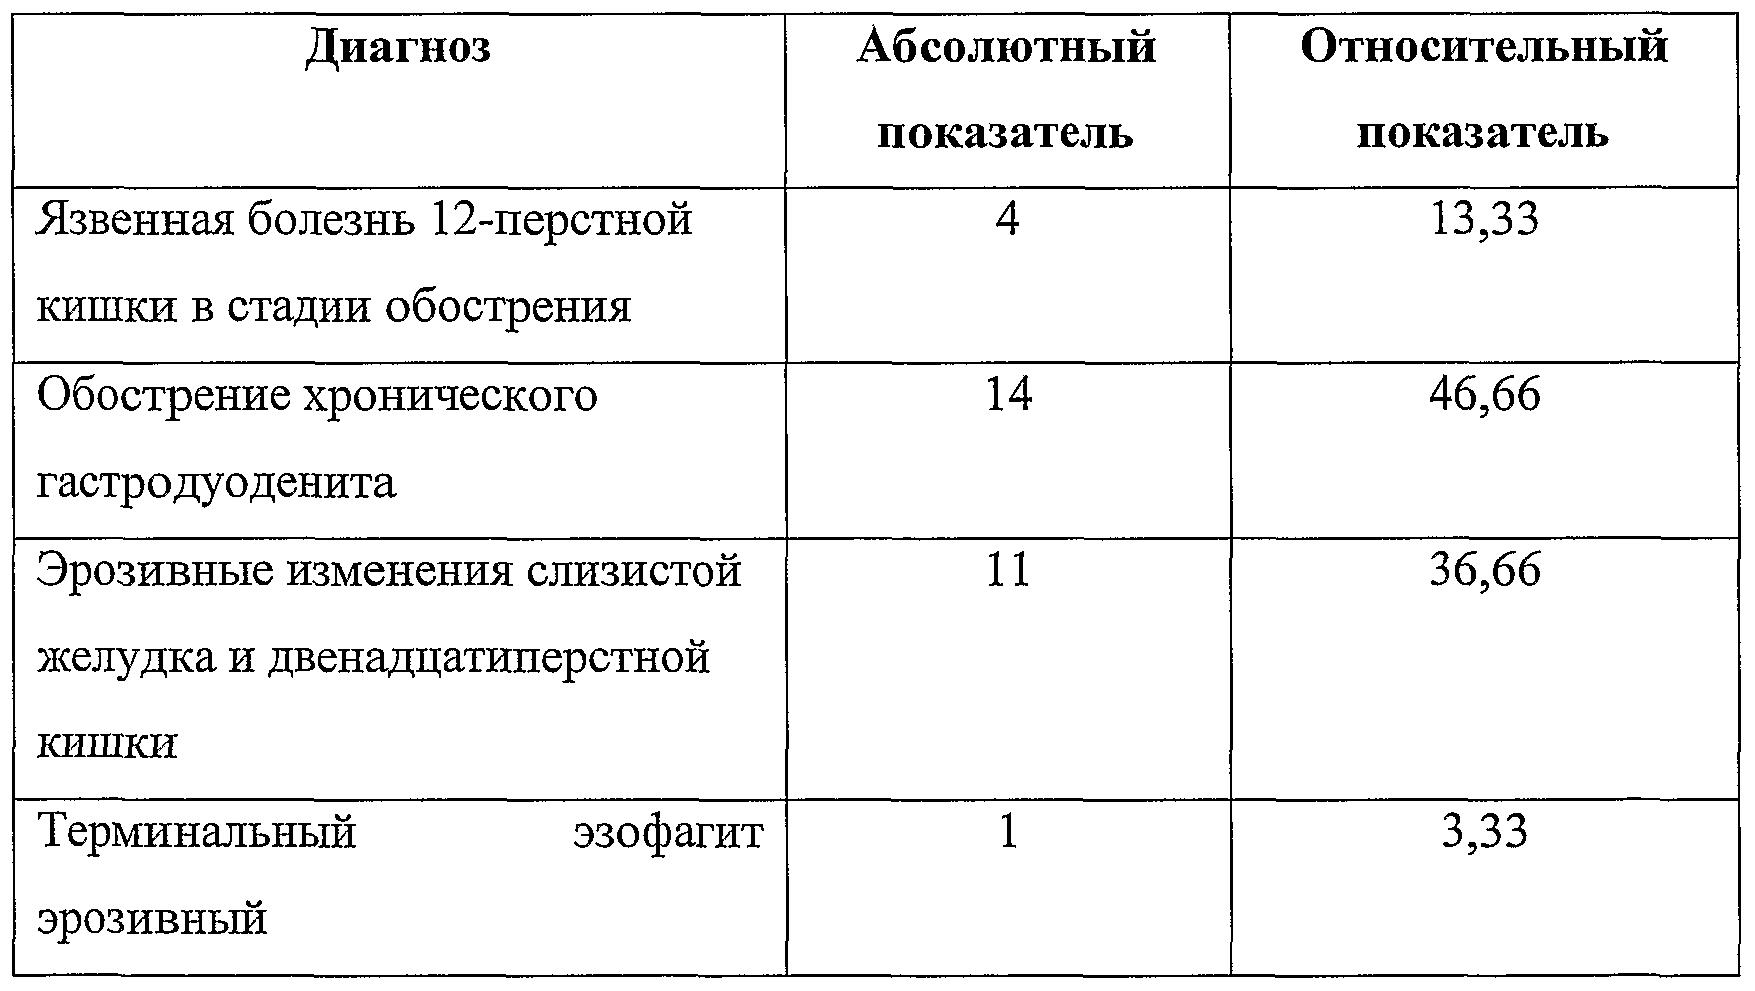 лечение хеликобактер пилори фромилид схема лечения